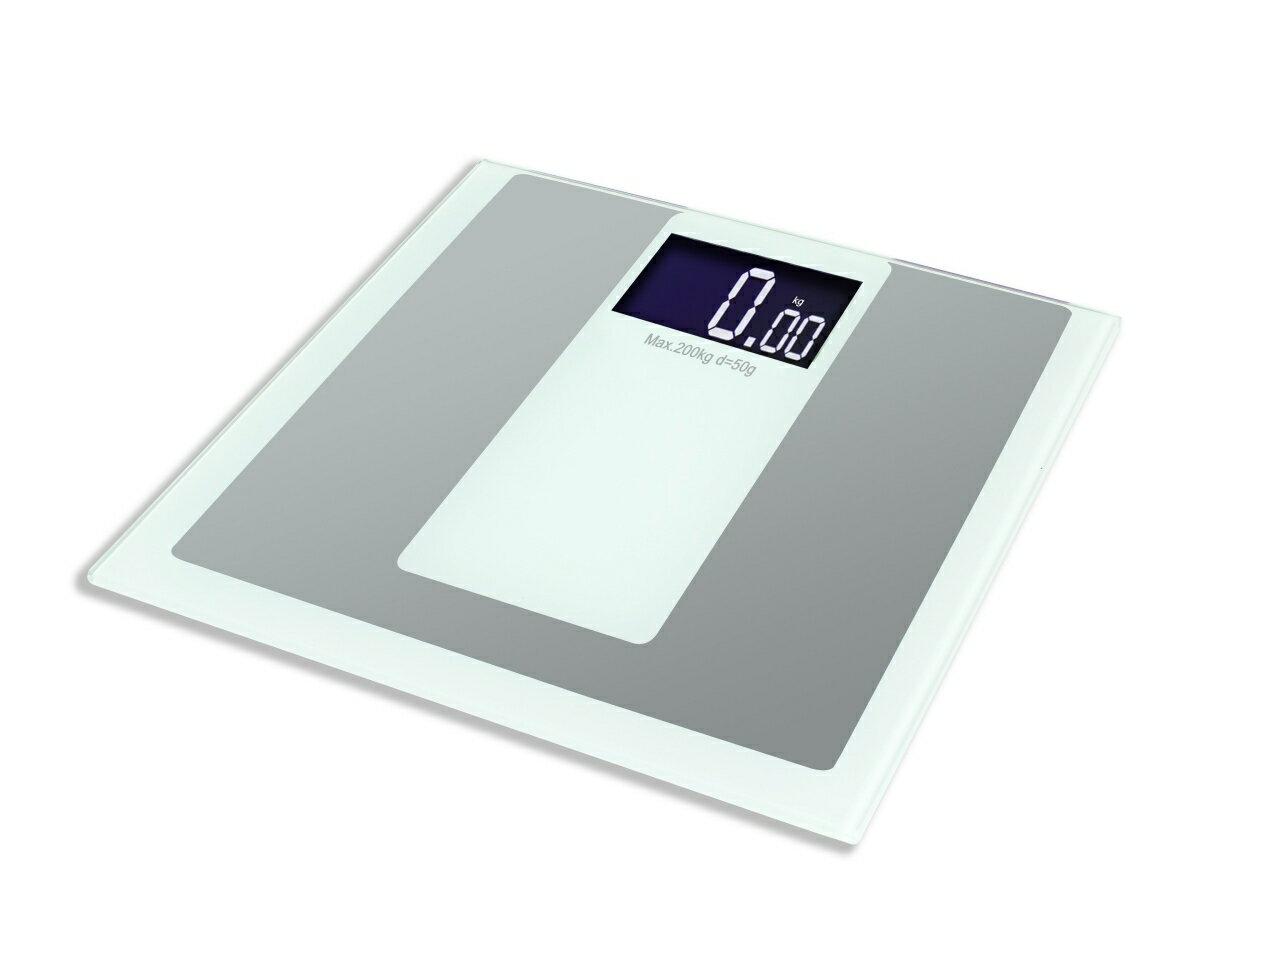 【SunEasy生活館】TECO 東元藍光體重計(XYFWT481)/強化玻璃/電子秤/人體秤